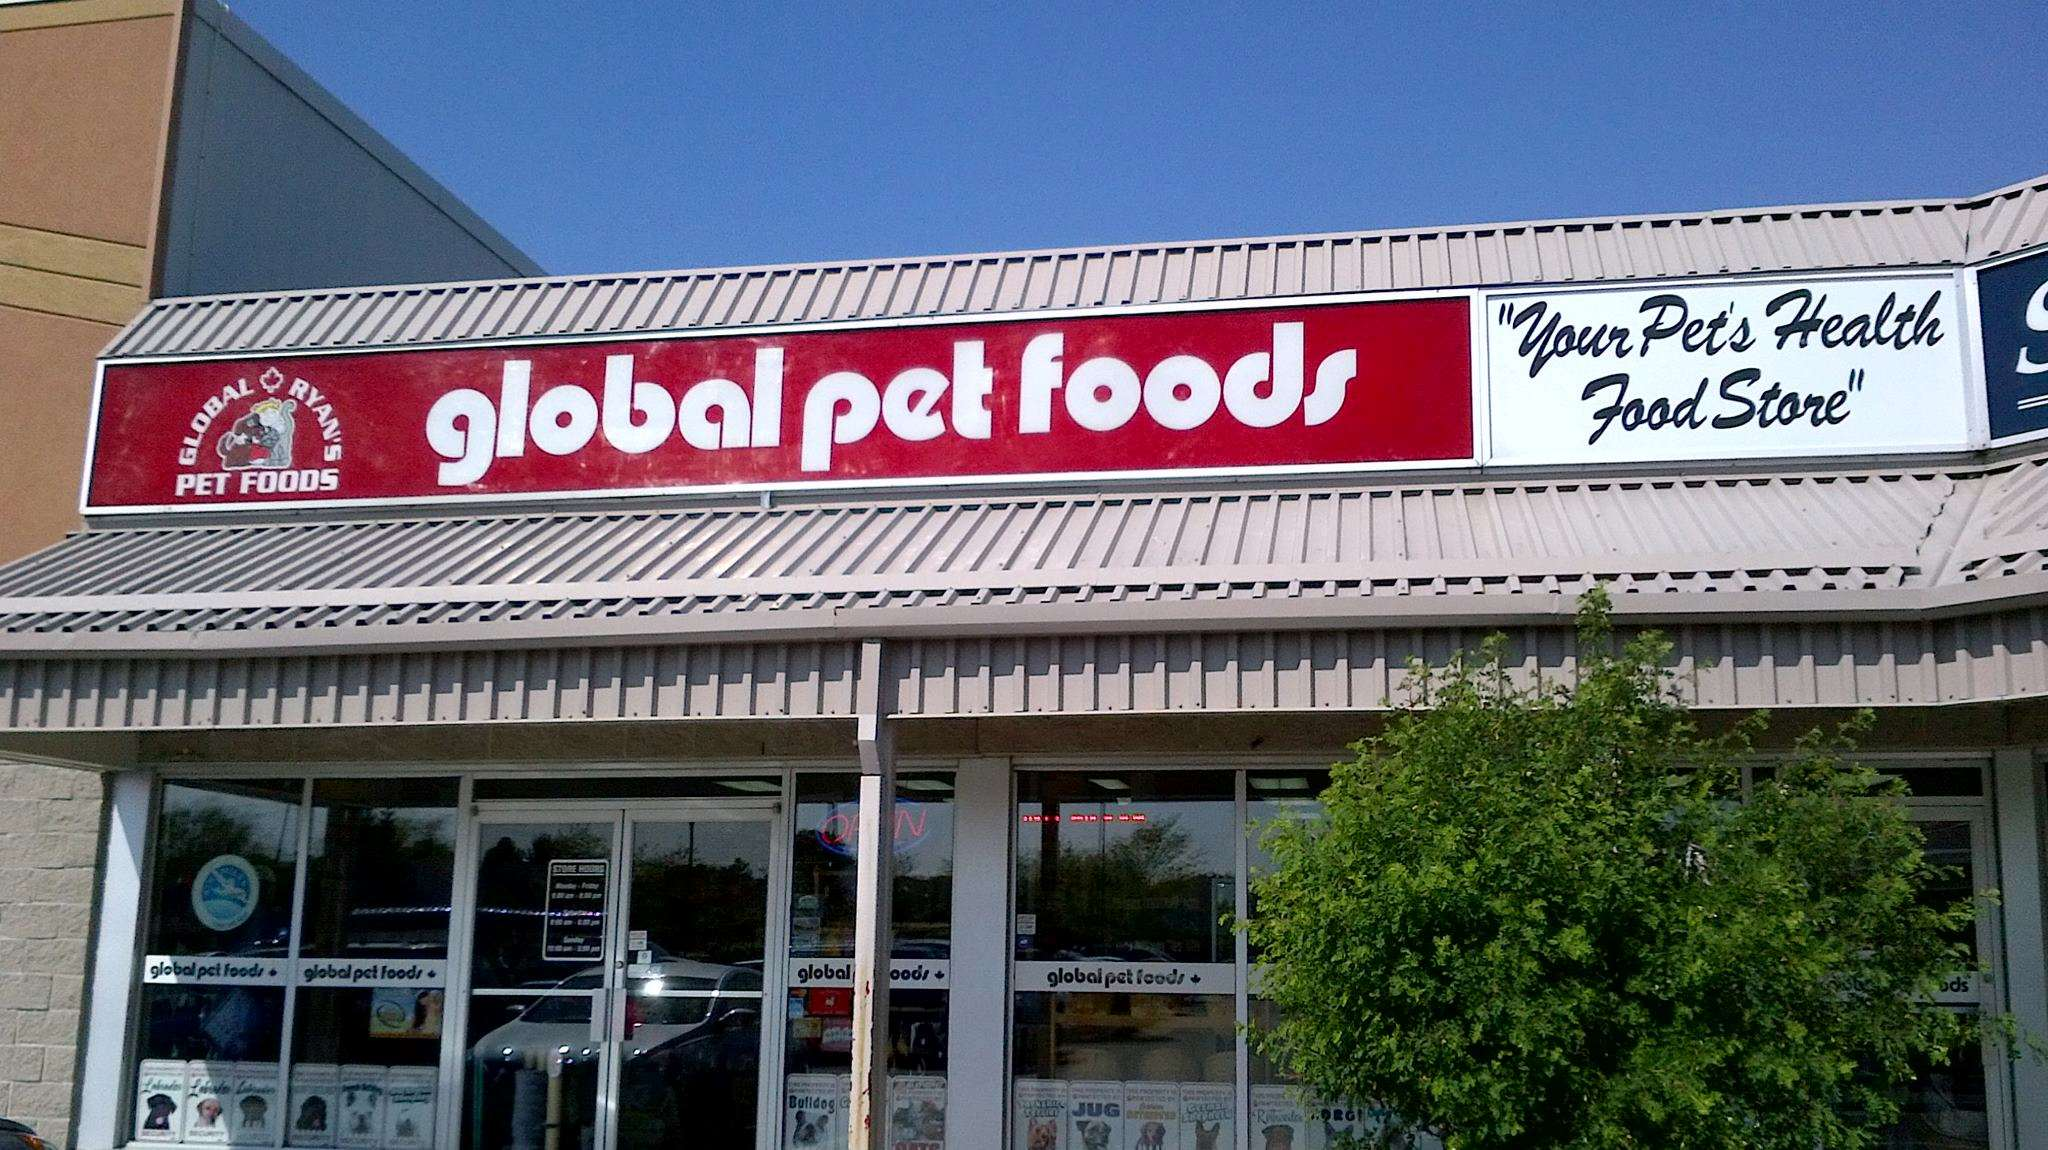 Global Pet Foods